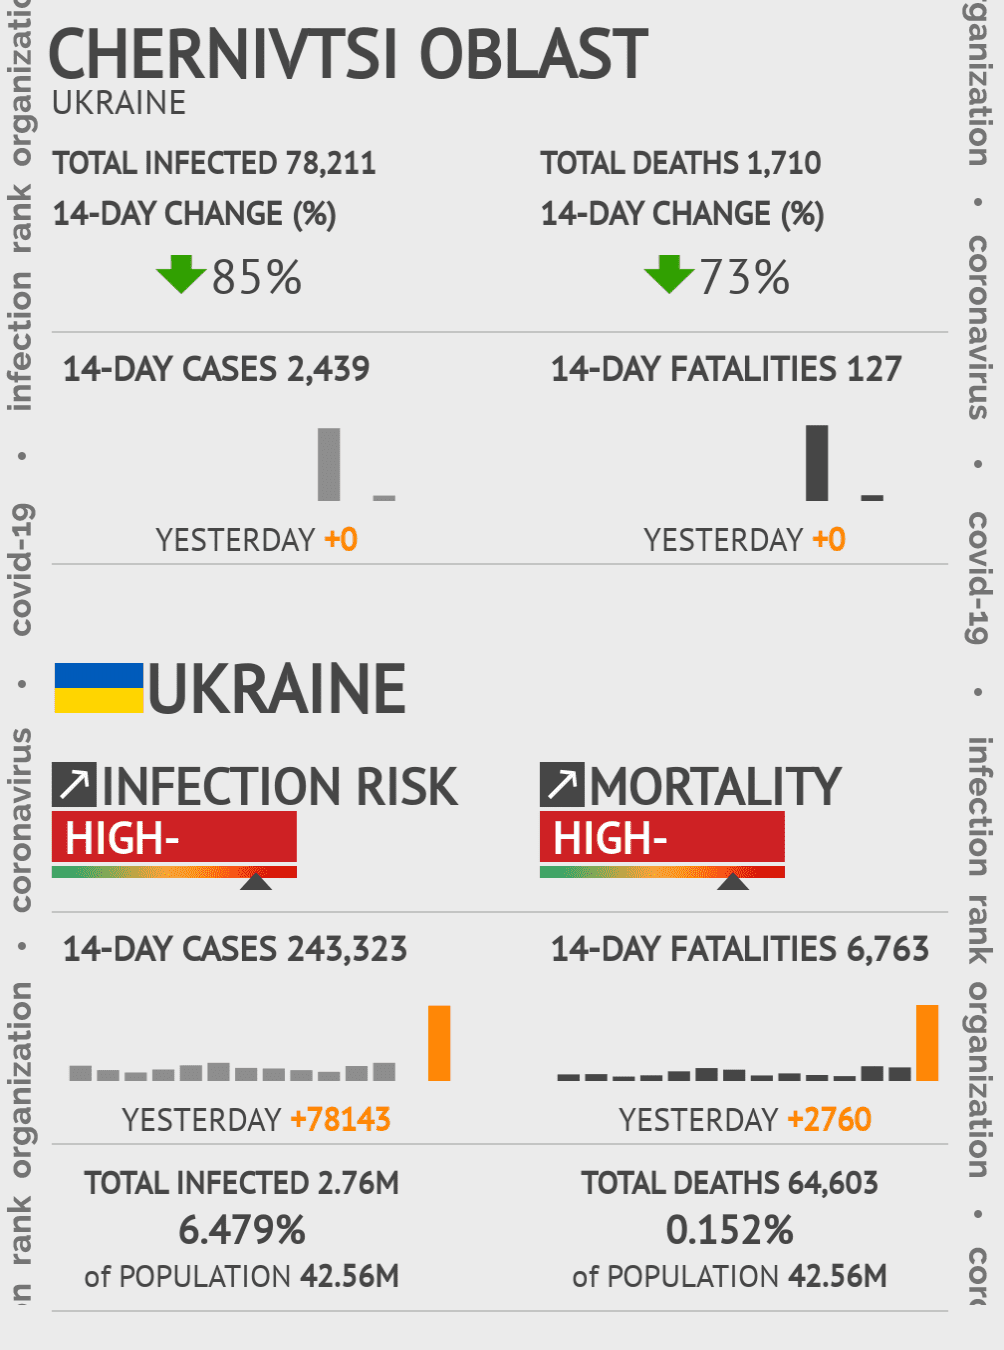 Chernivtsi Oblast Coronavirus Covid-19 Risk of Infection on March 02, 2021